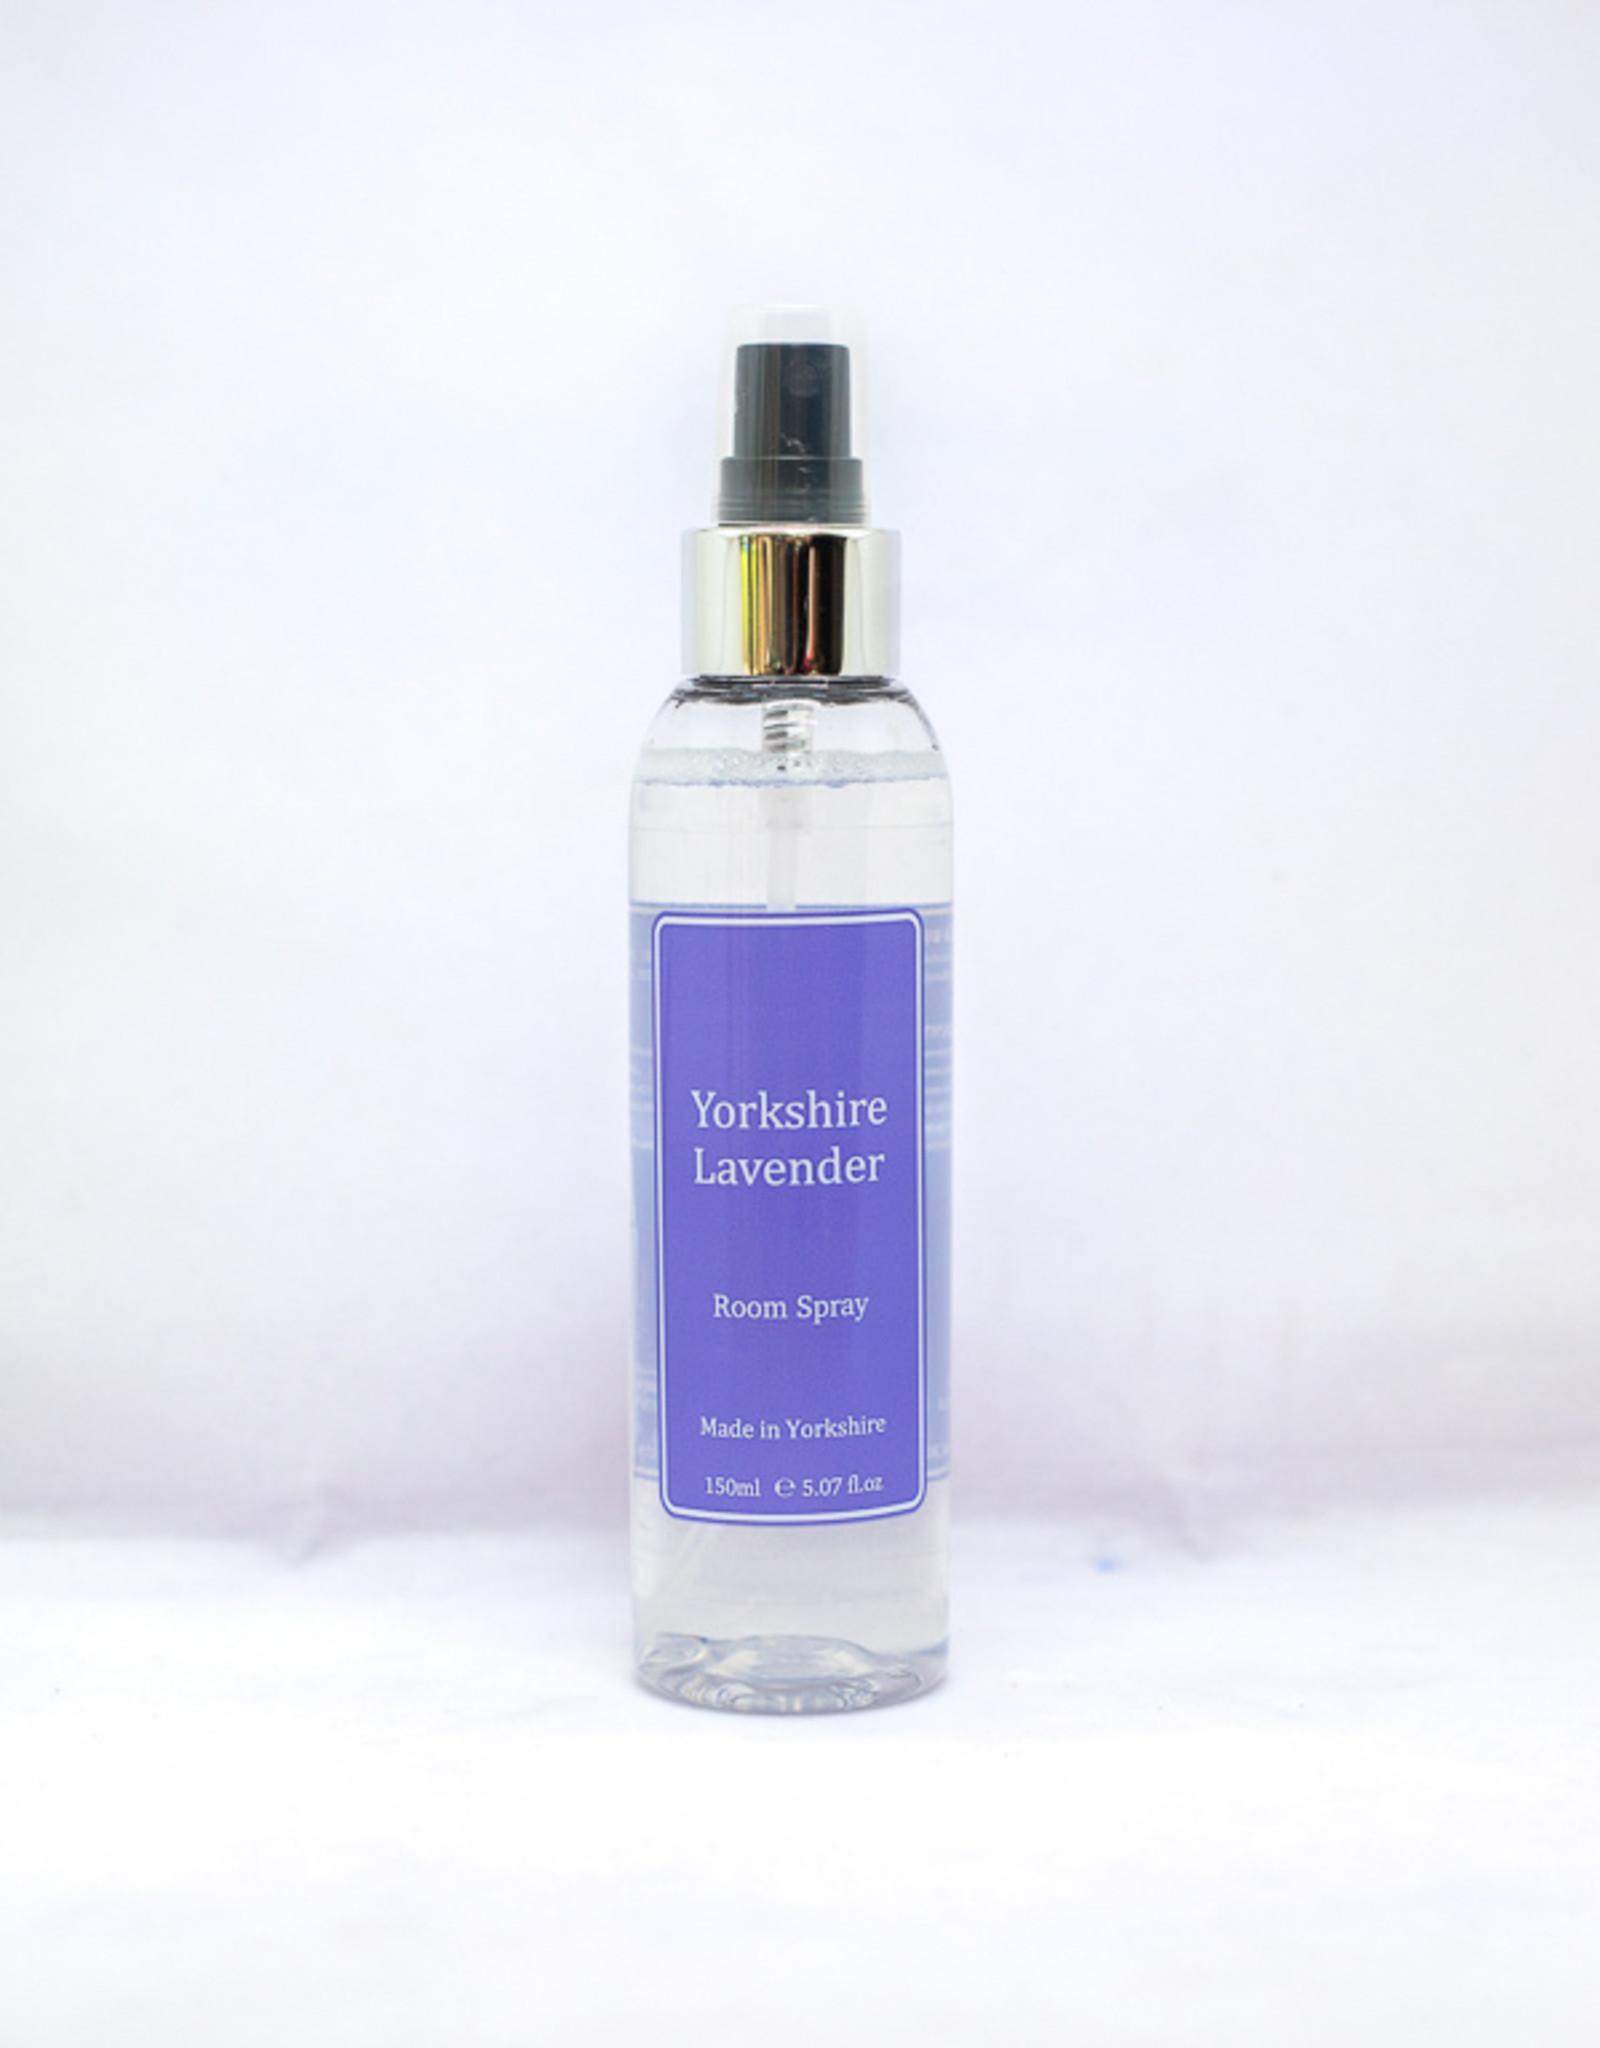 Yorkshire Lavender Room Spray